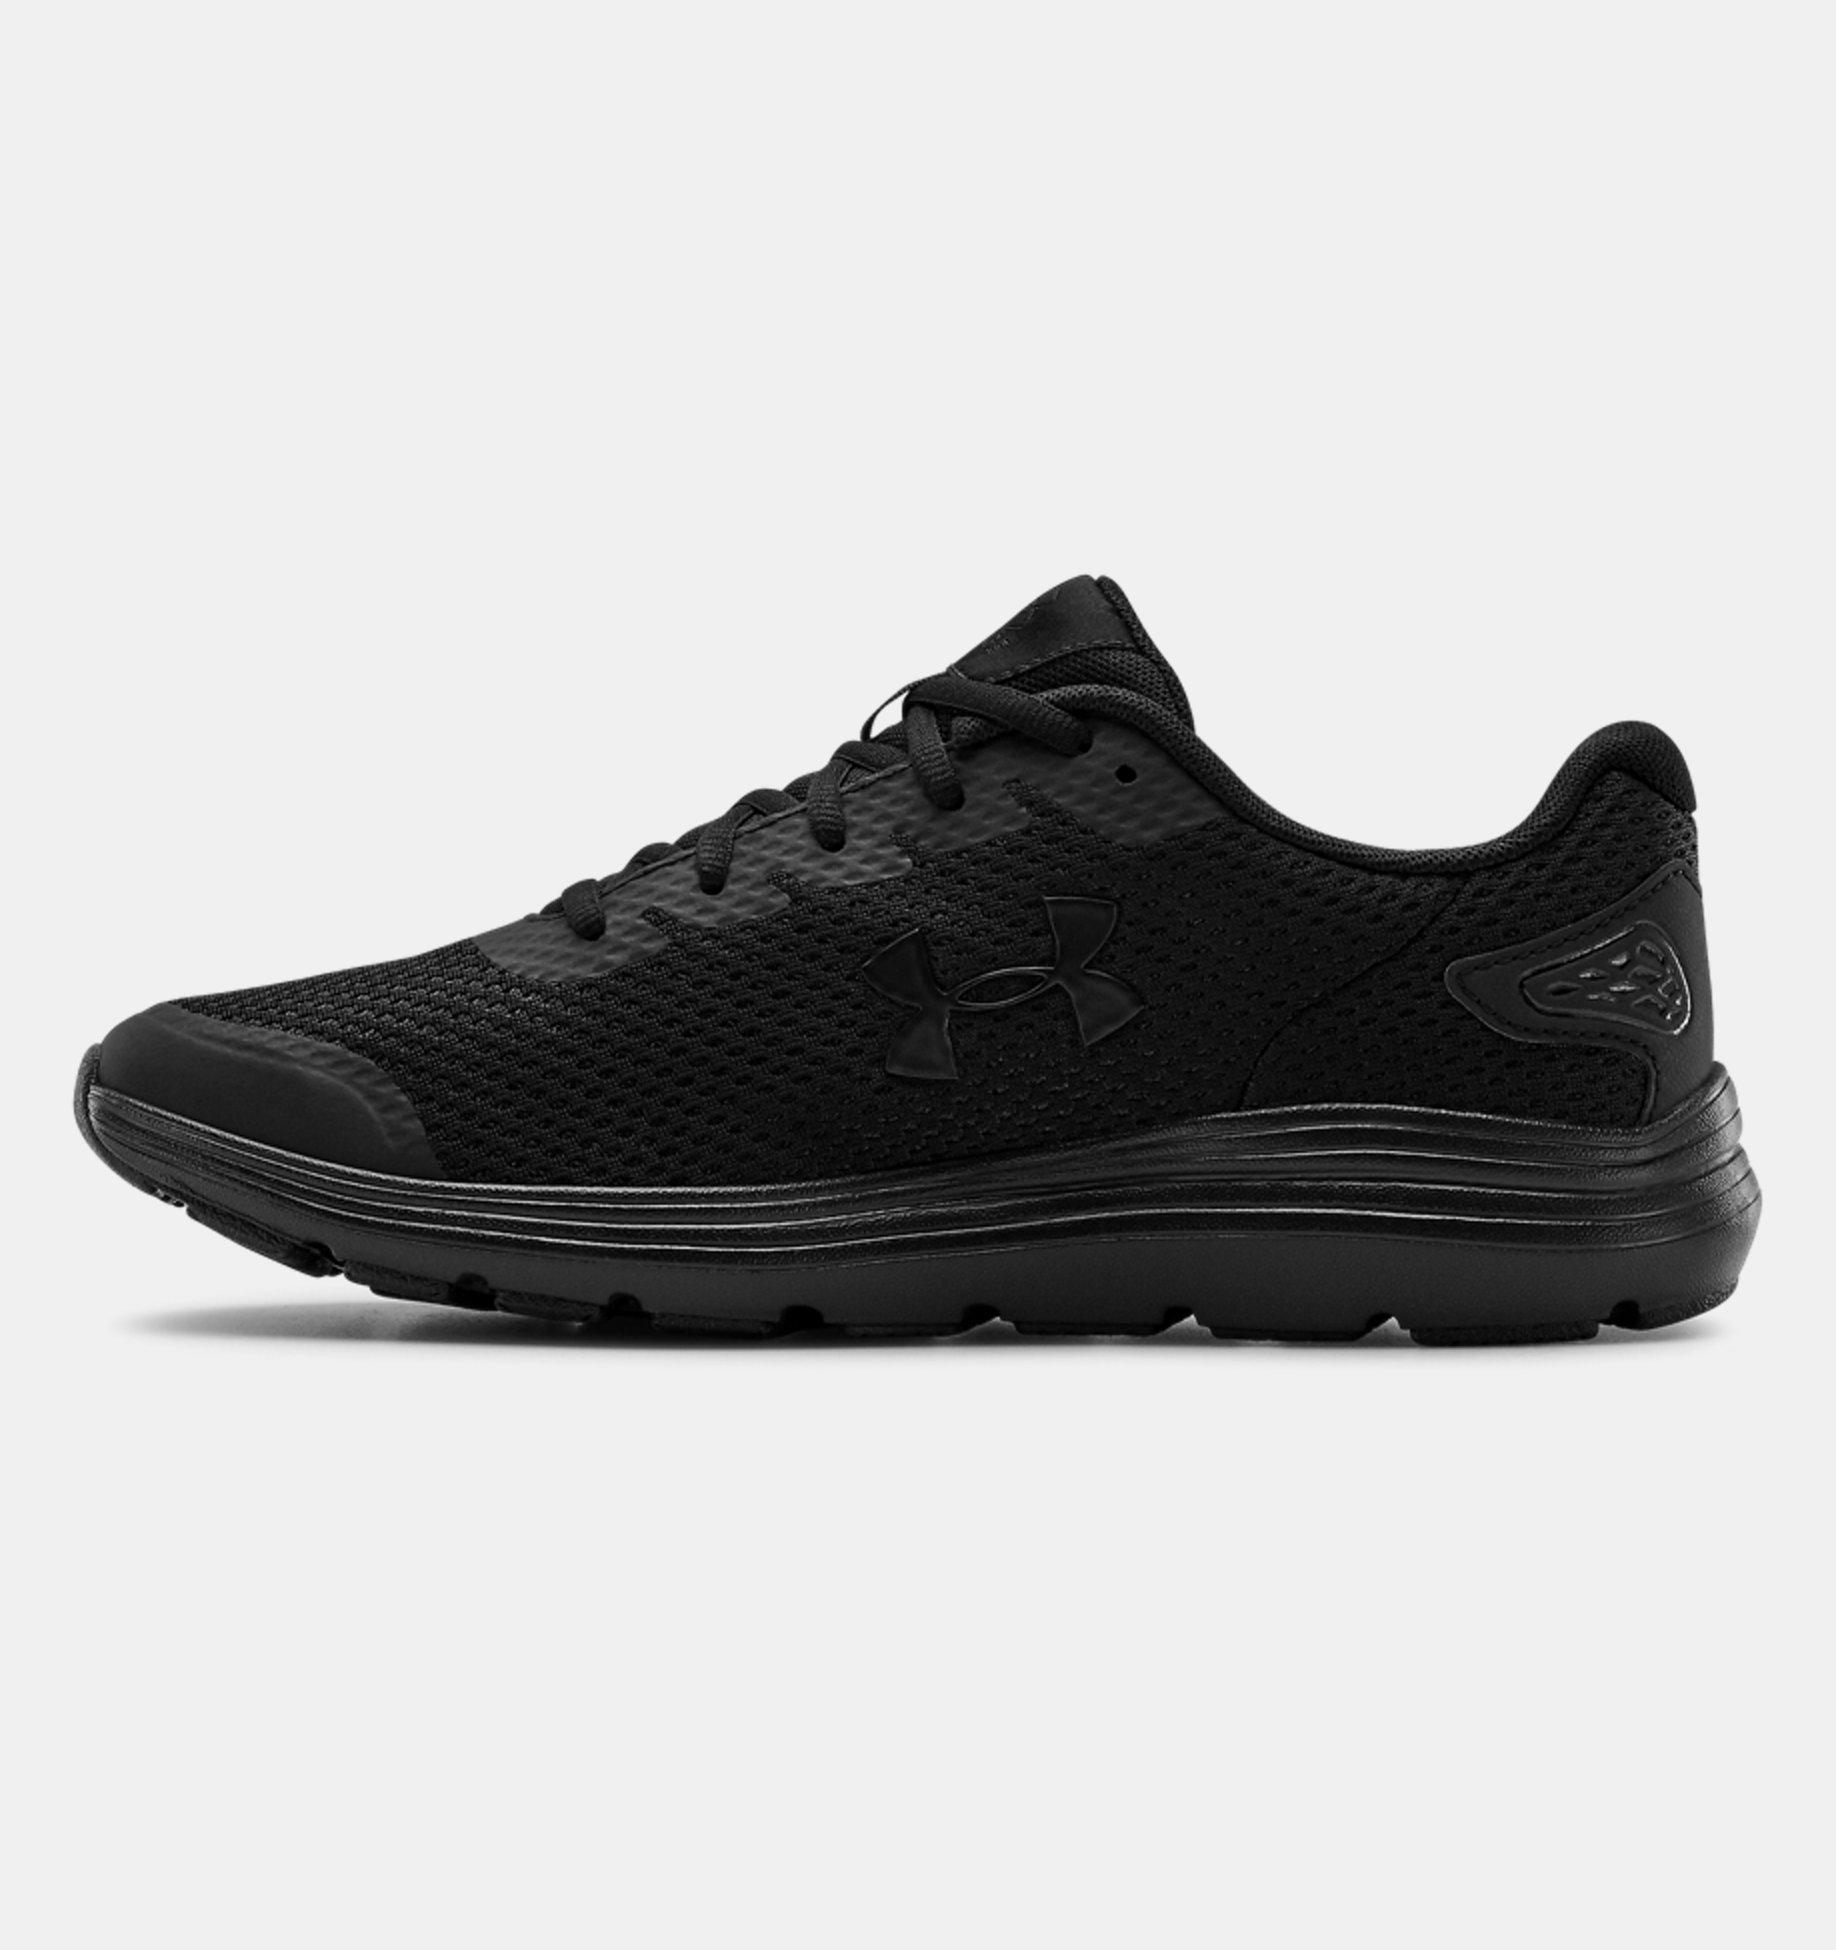 emprender vapor Viento  Men's UA Surge 2 Running Shoes | Under Armour